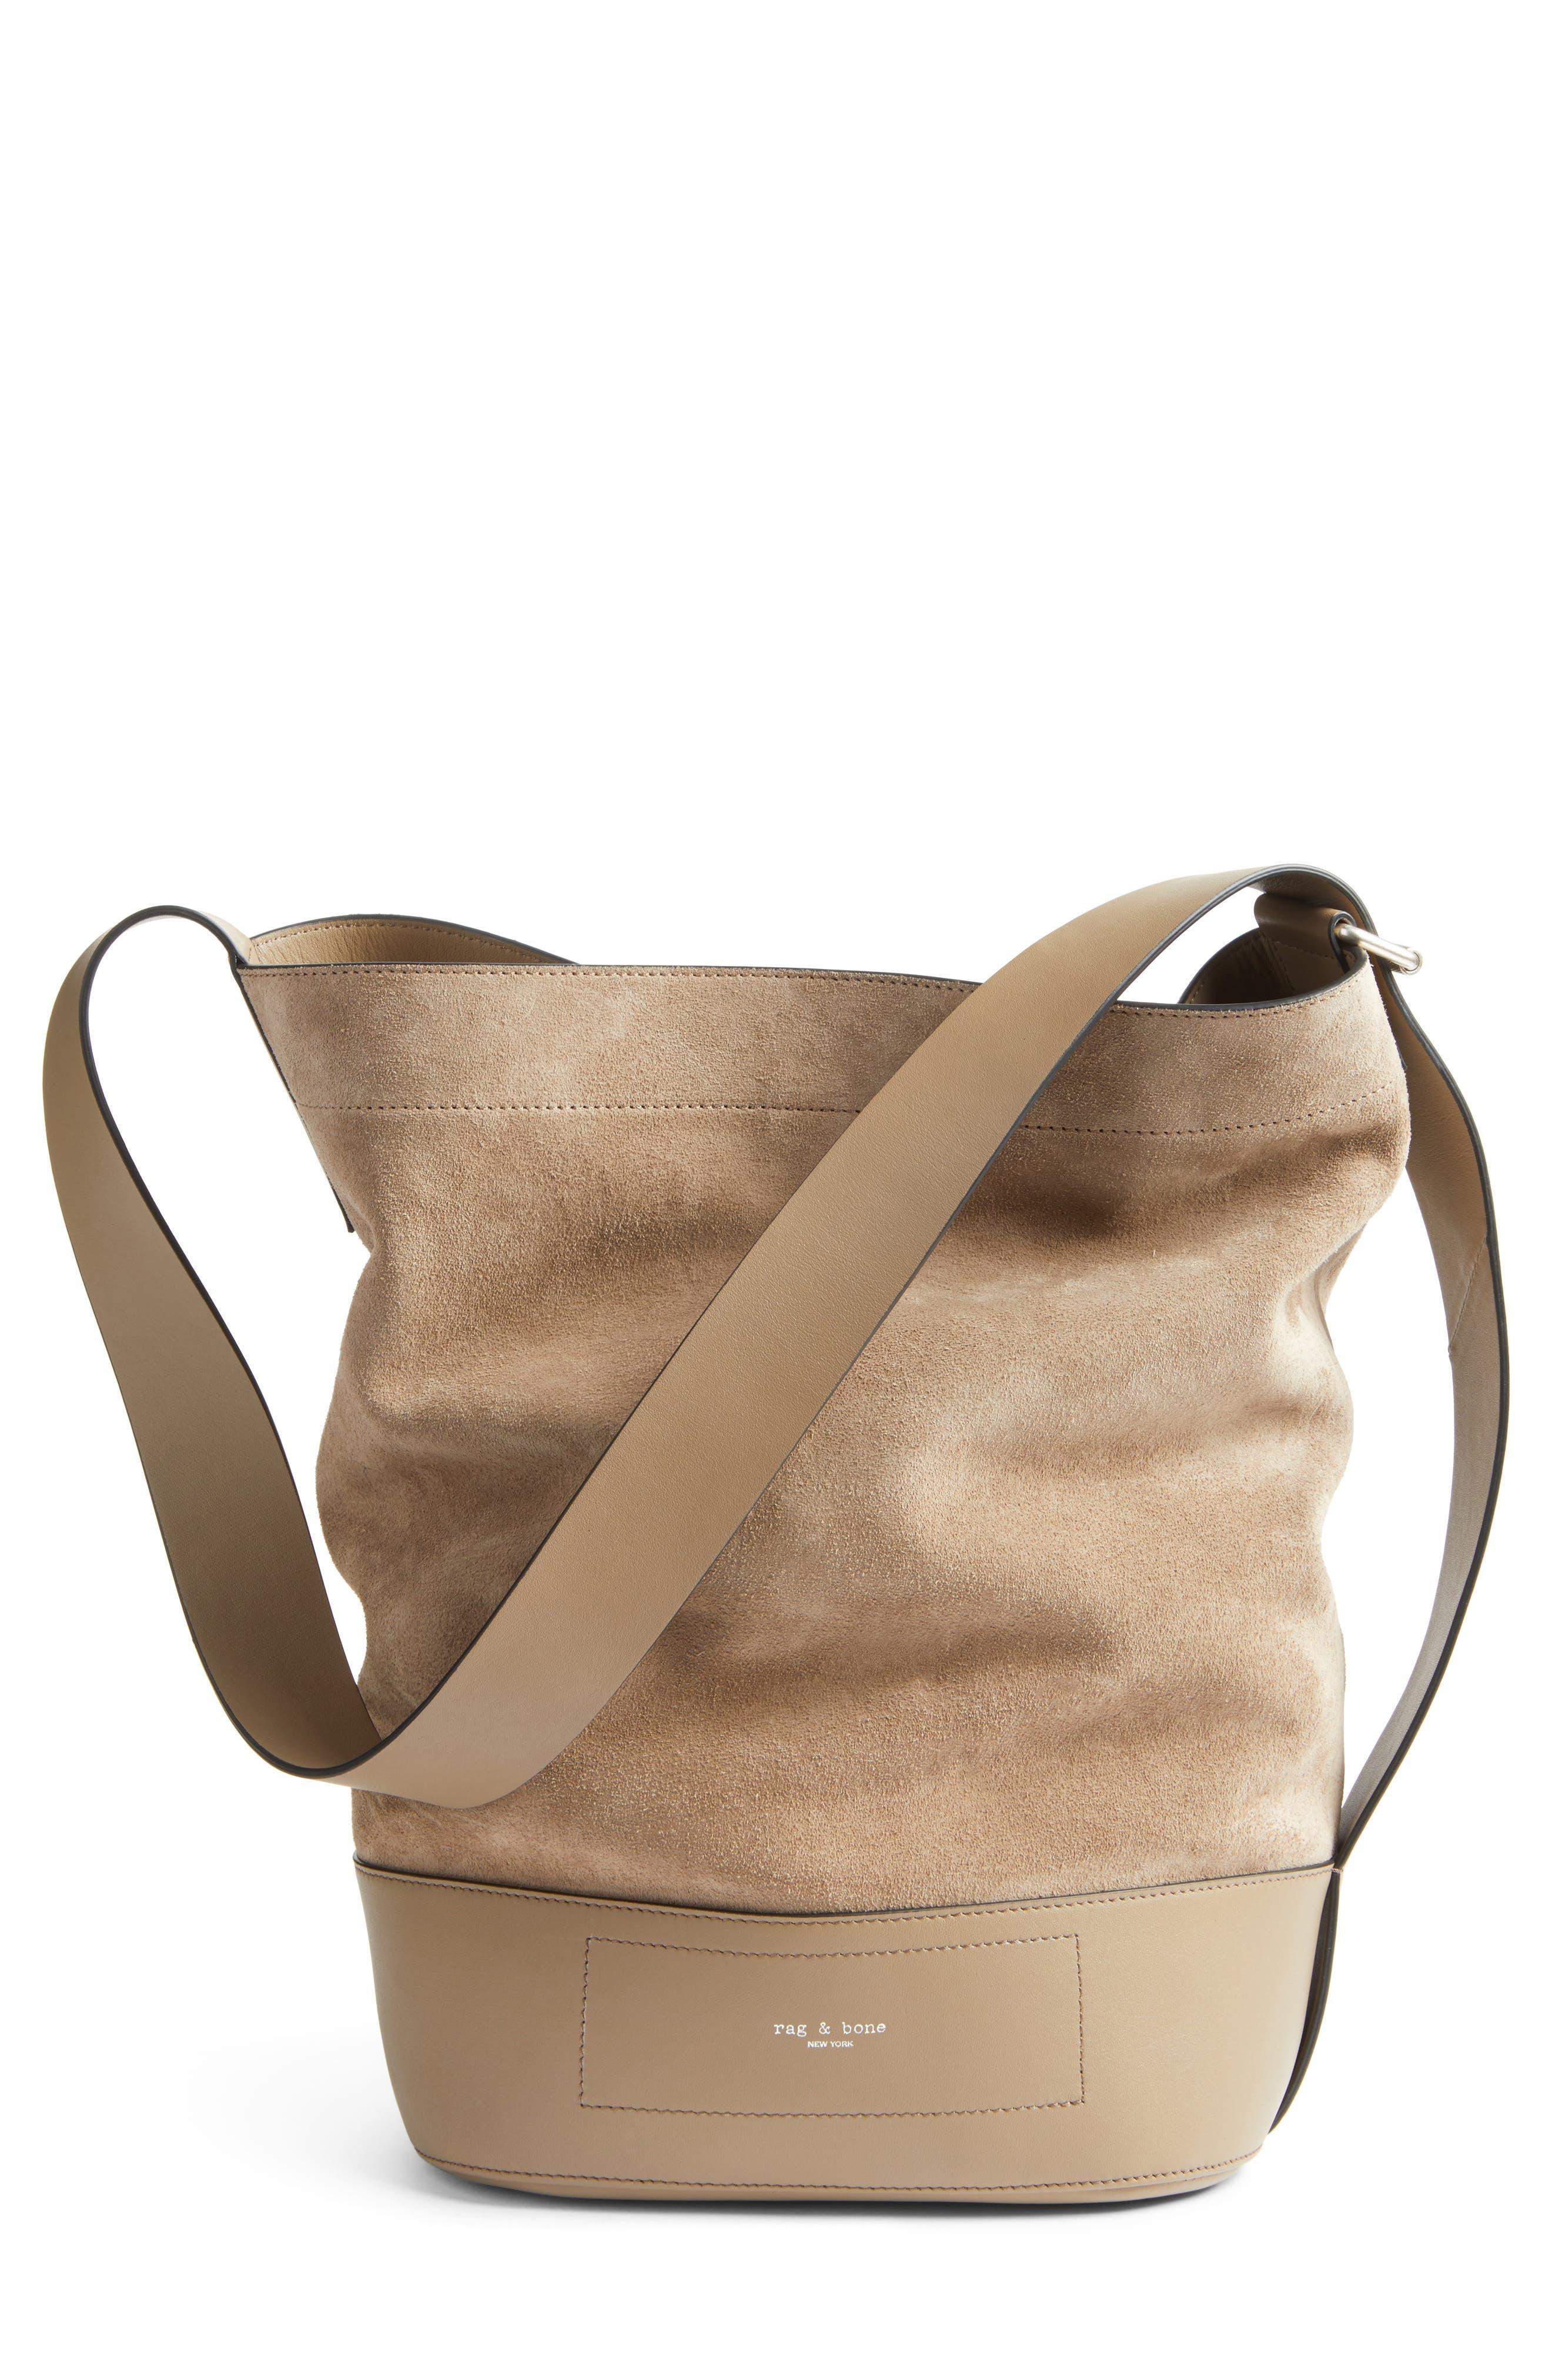 rag and bone Walker Sling Leather & Suede Bucket Bag,                             Main thumbnail 1, color,                             099